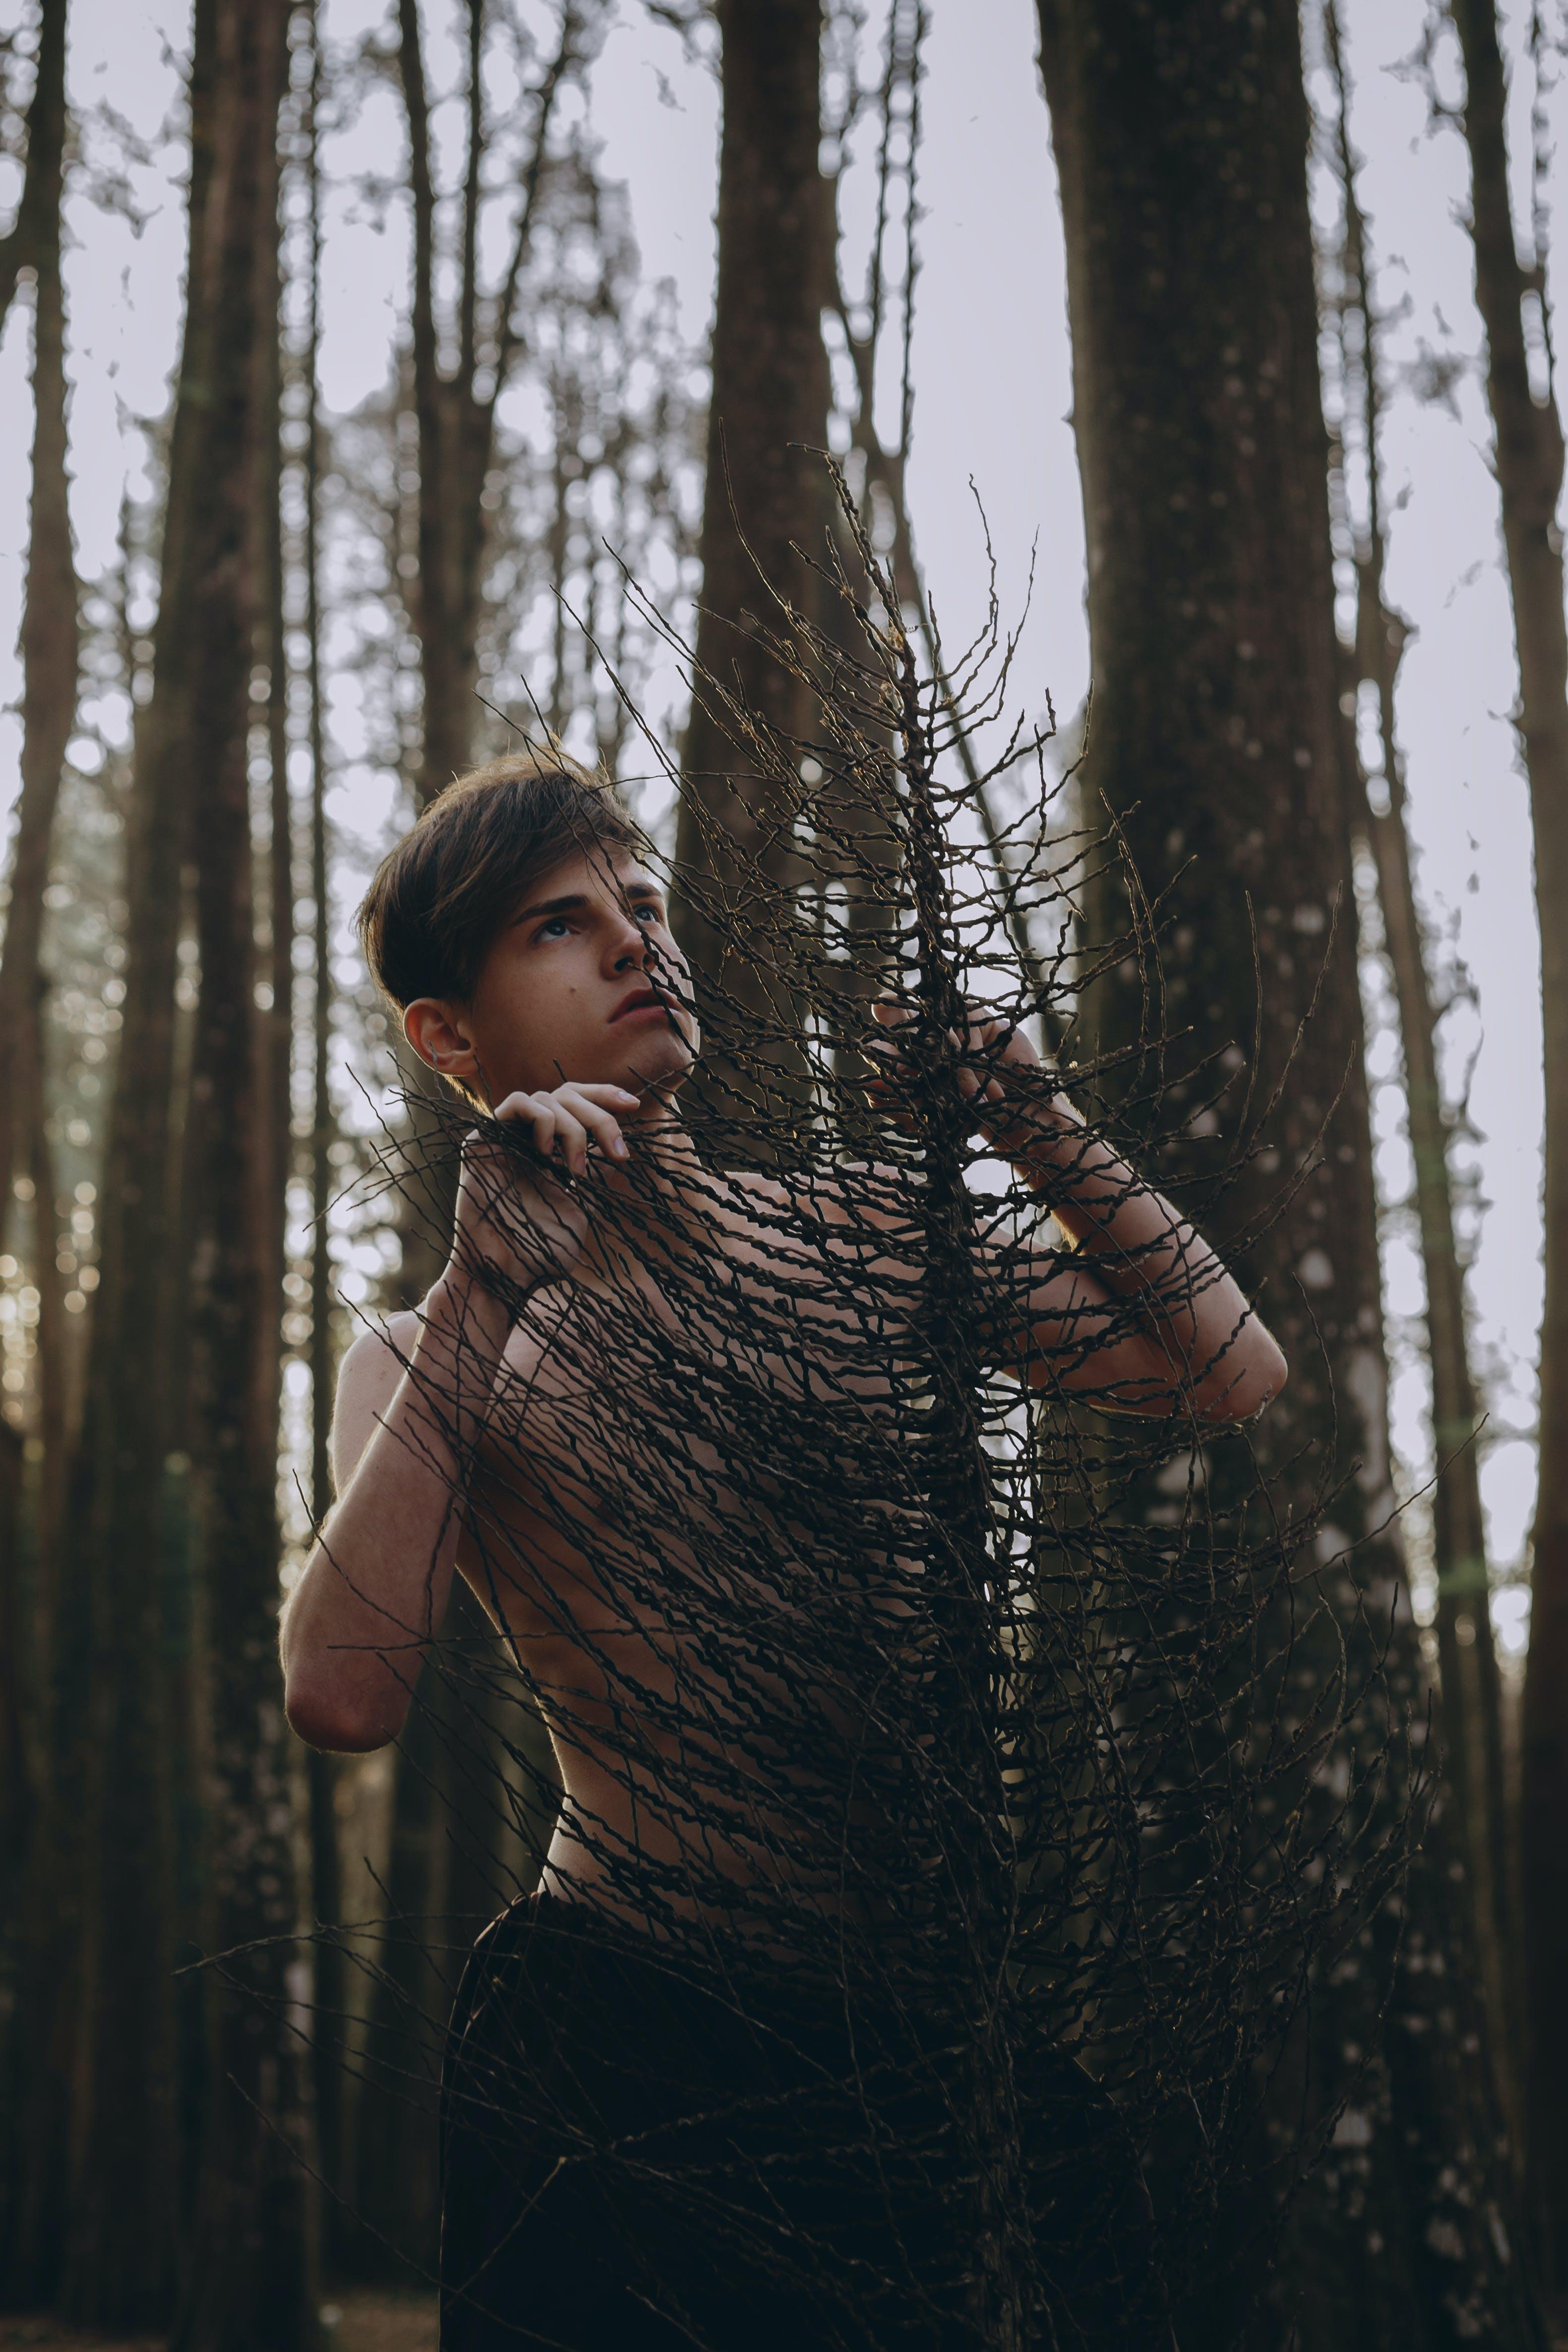 Man Holding Onto Tree